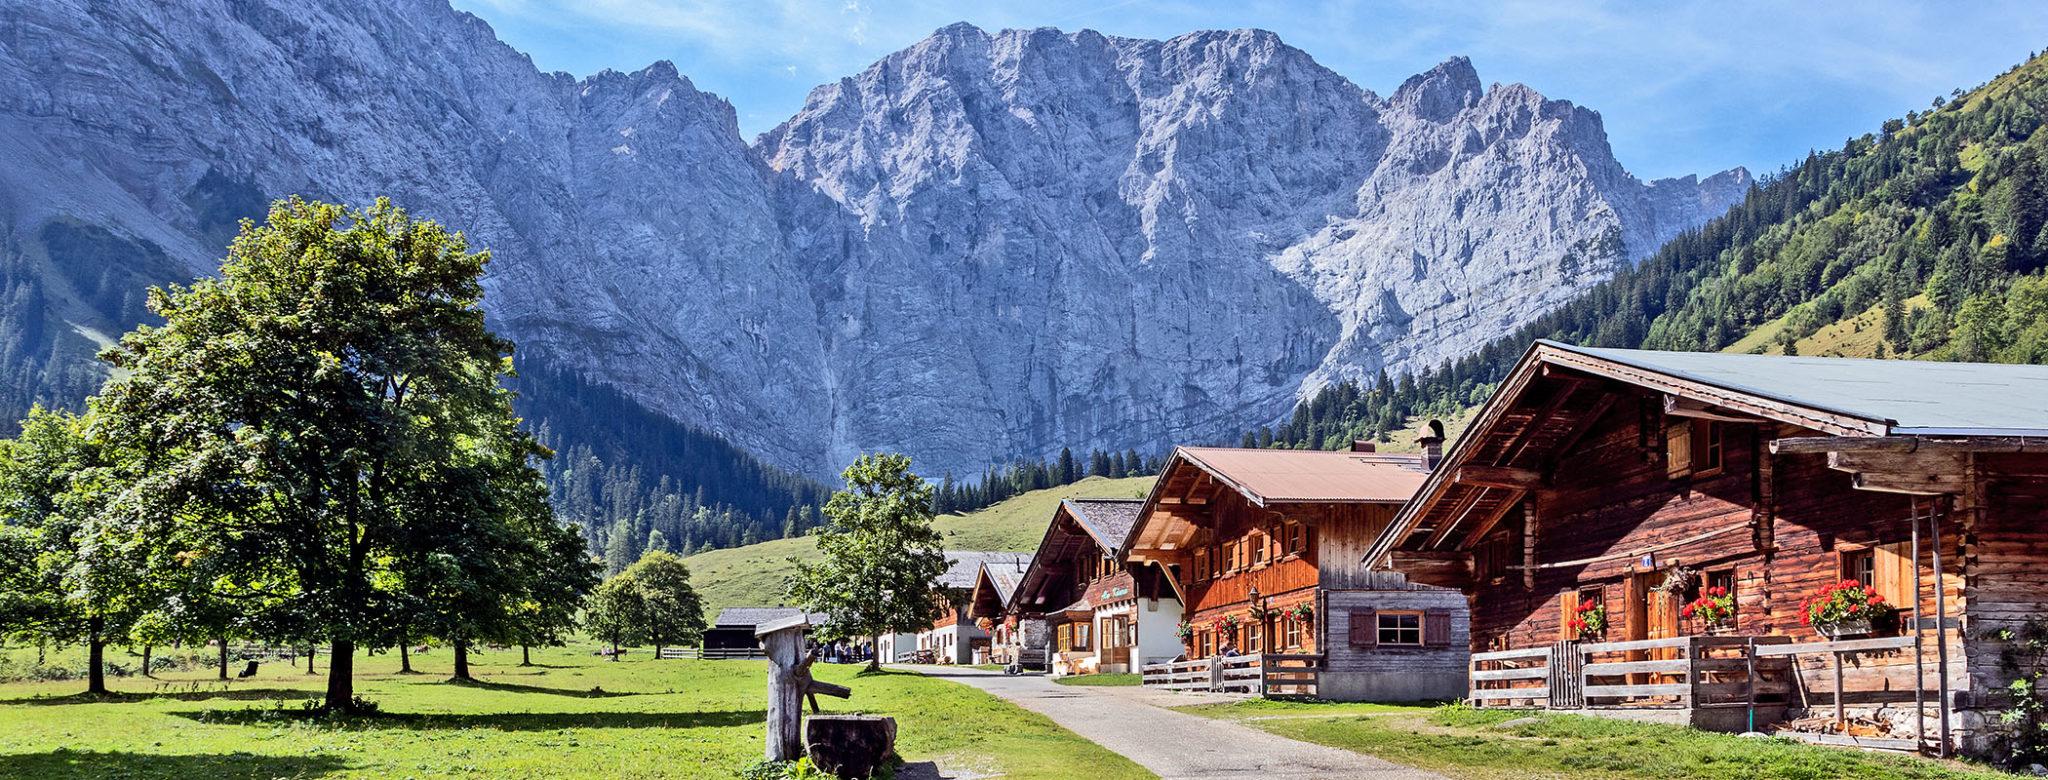 TIROL: Ausflug zum Ahornboden & Eng Alm im Karwendel